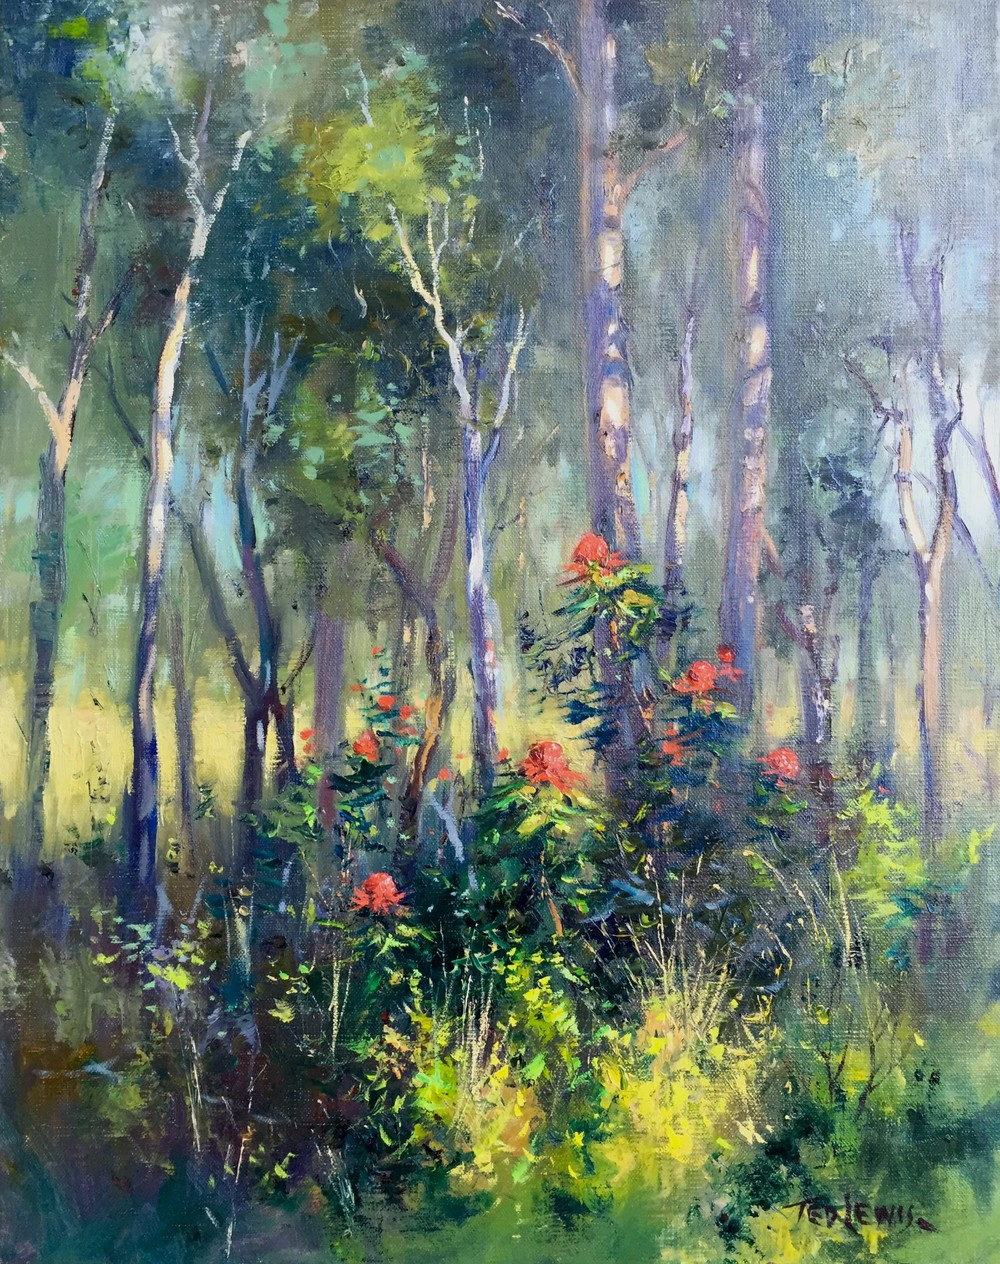 Ted Lewis 'Bush Glow' Oil on Canvas 51cm x 40cm  #14934